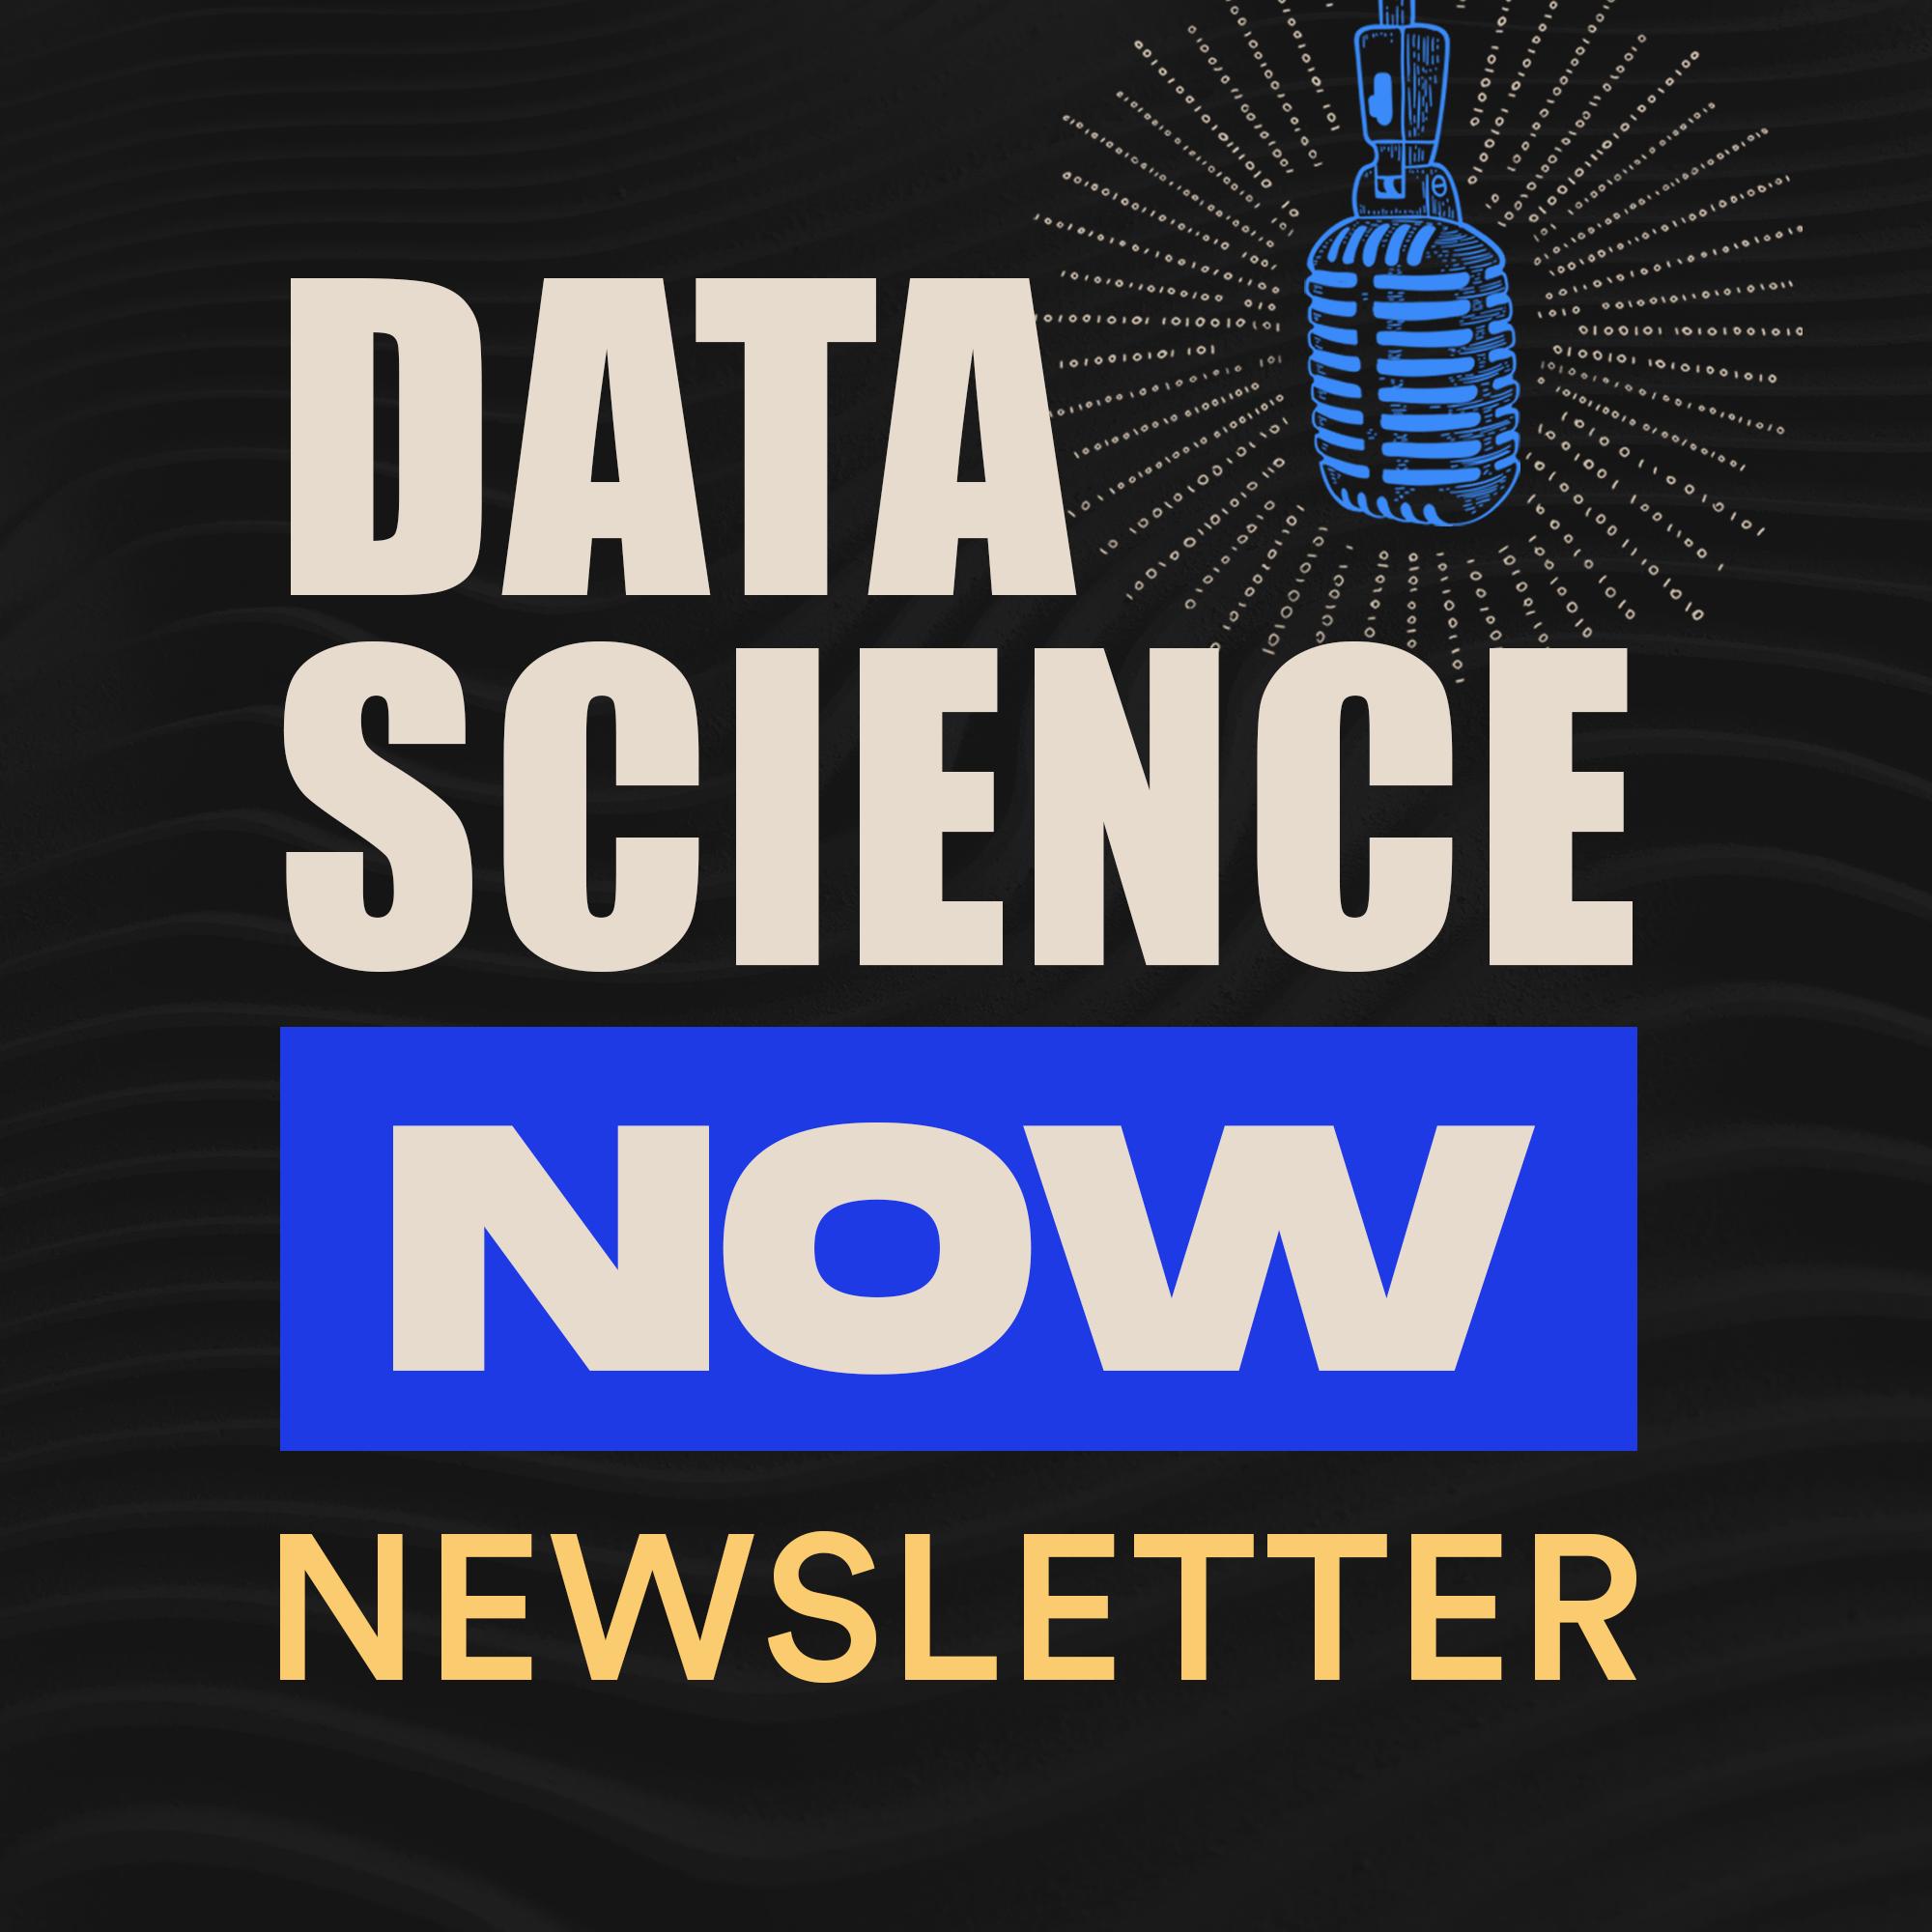 Data Science Now Newsletter